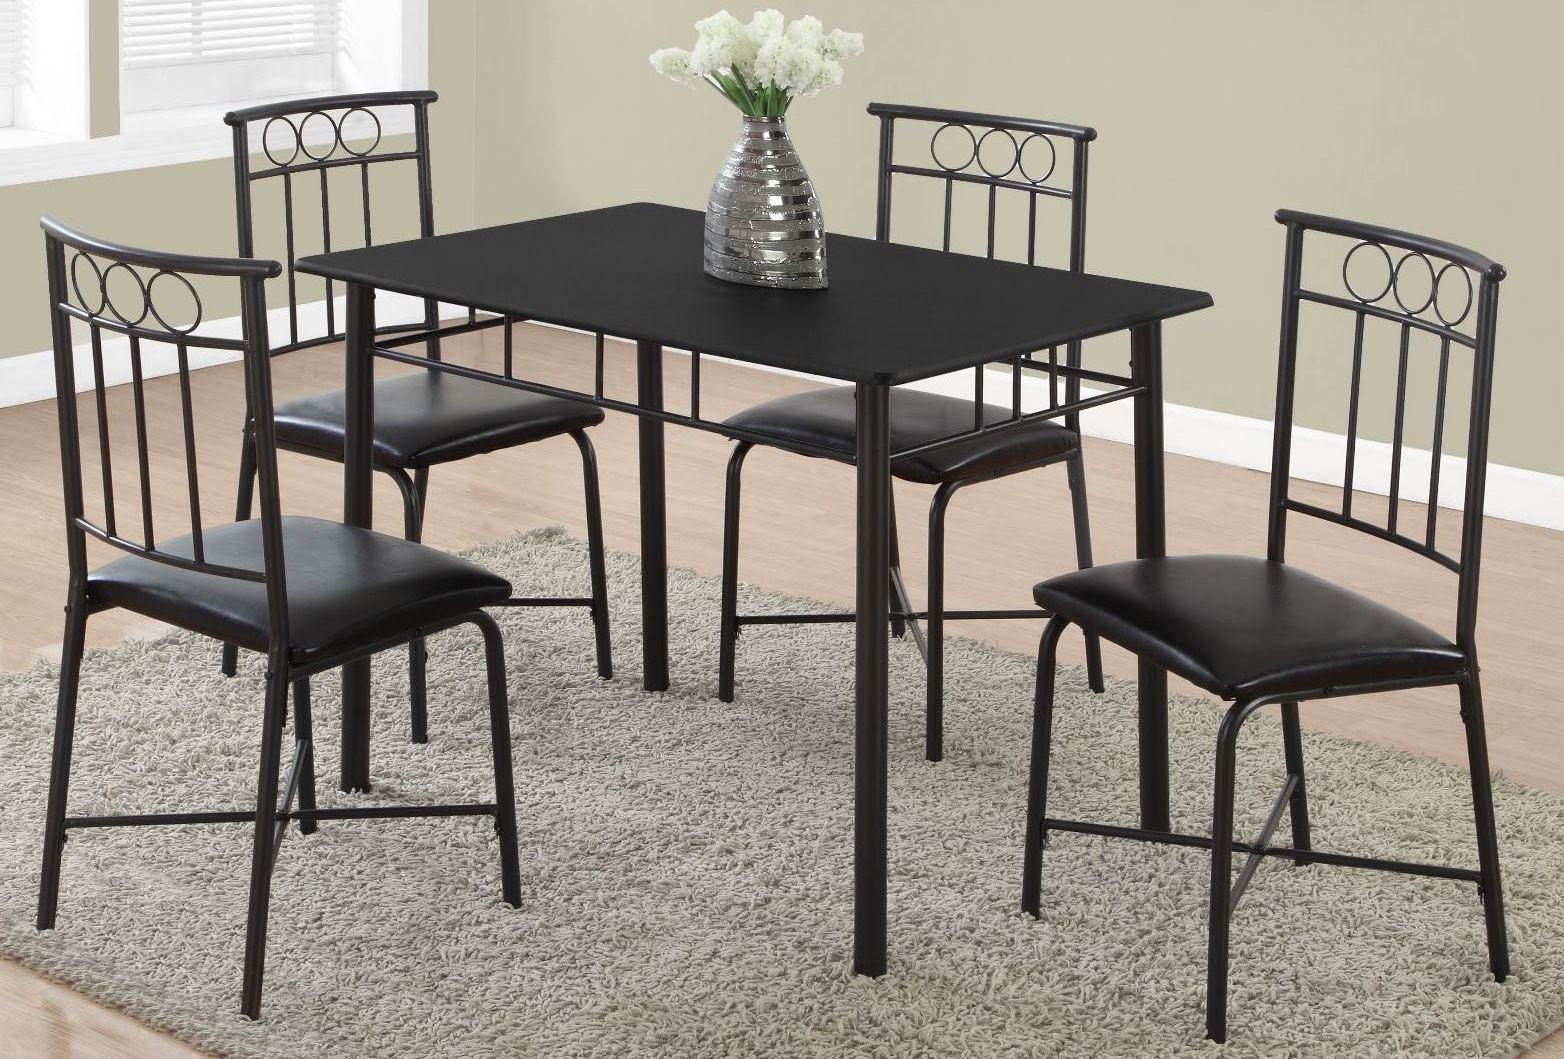 Black Metal 5 Piece Dining Room Set 1018 Monarch